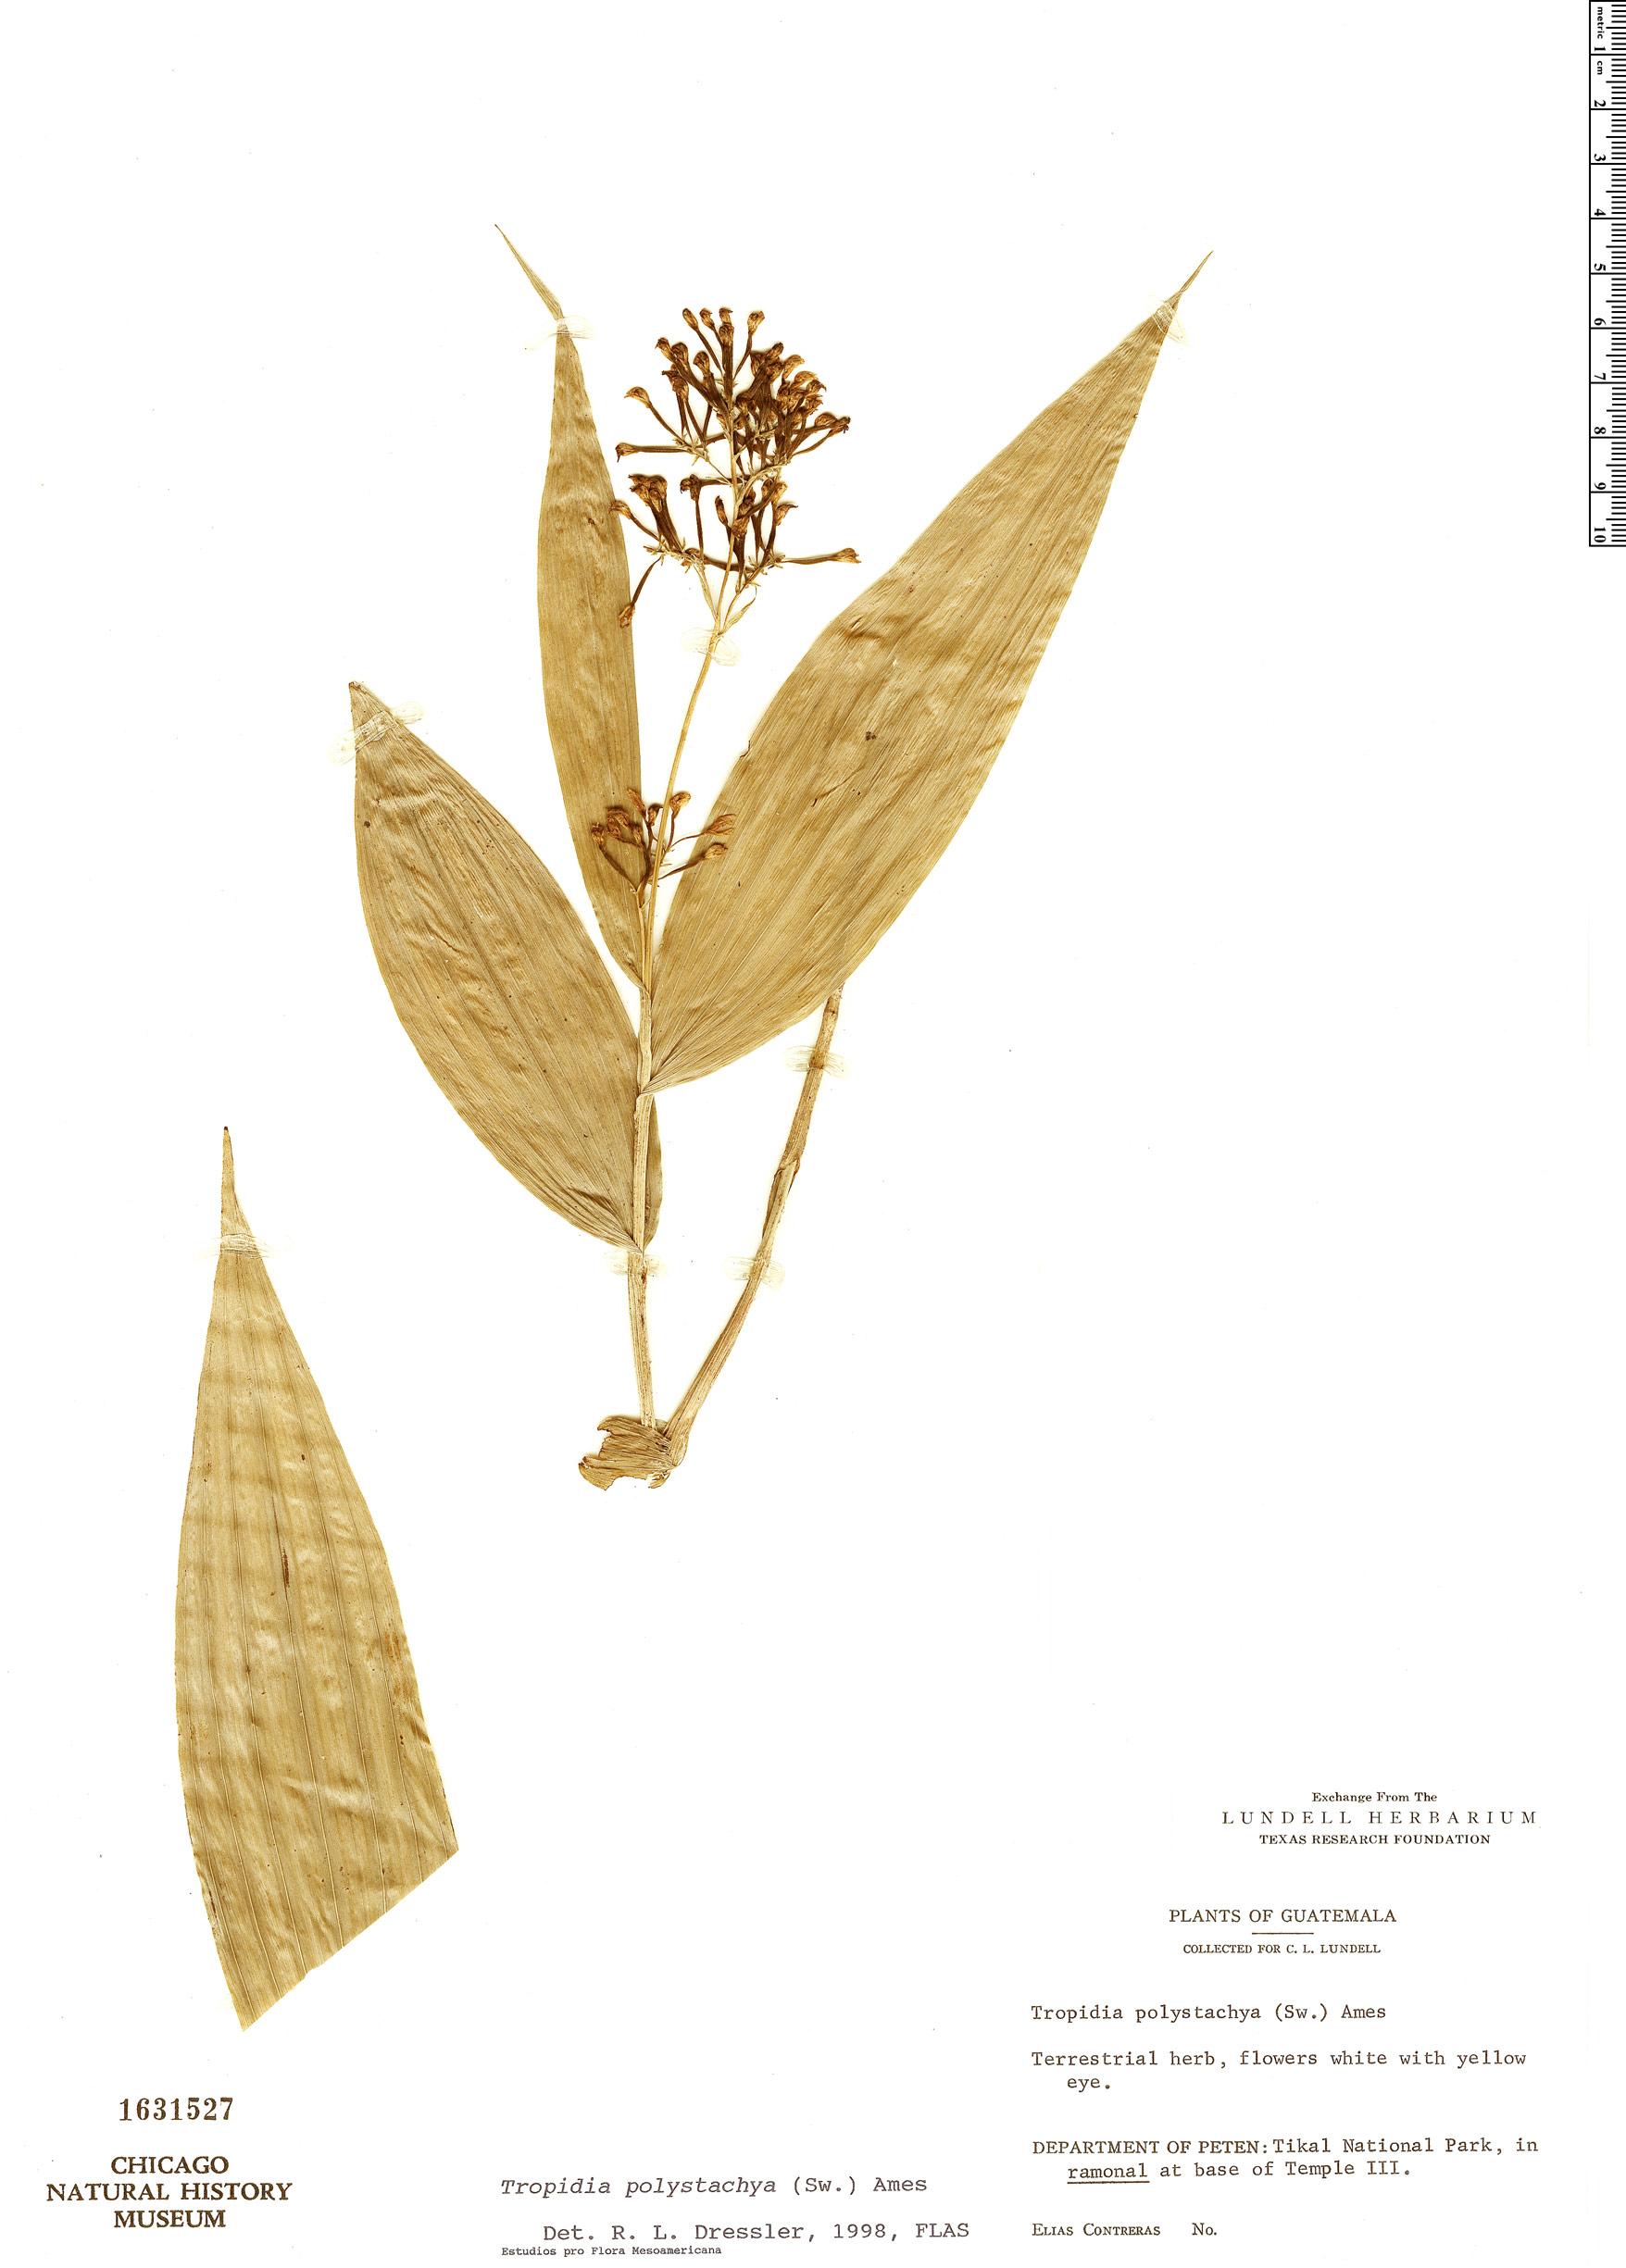 Specimen: Tropidia polystachya